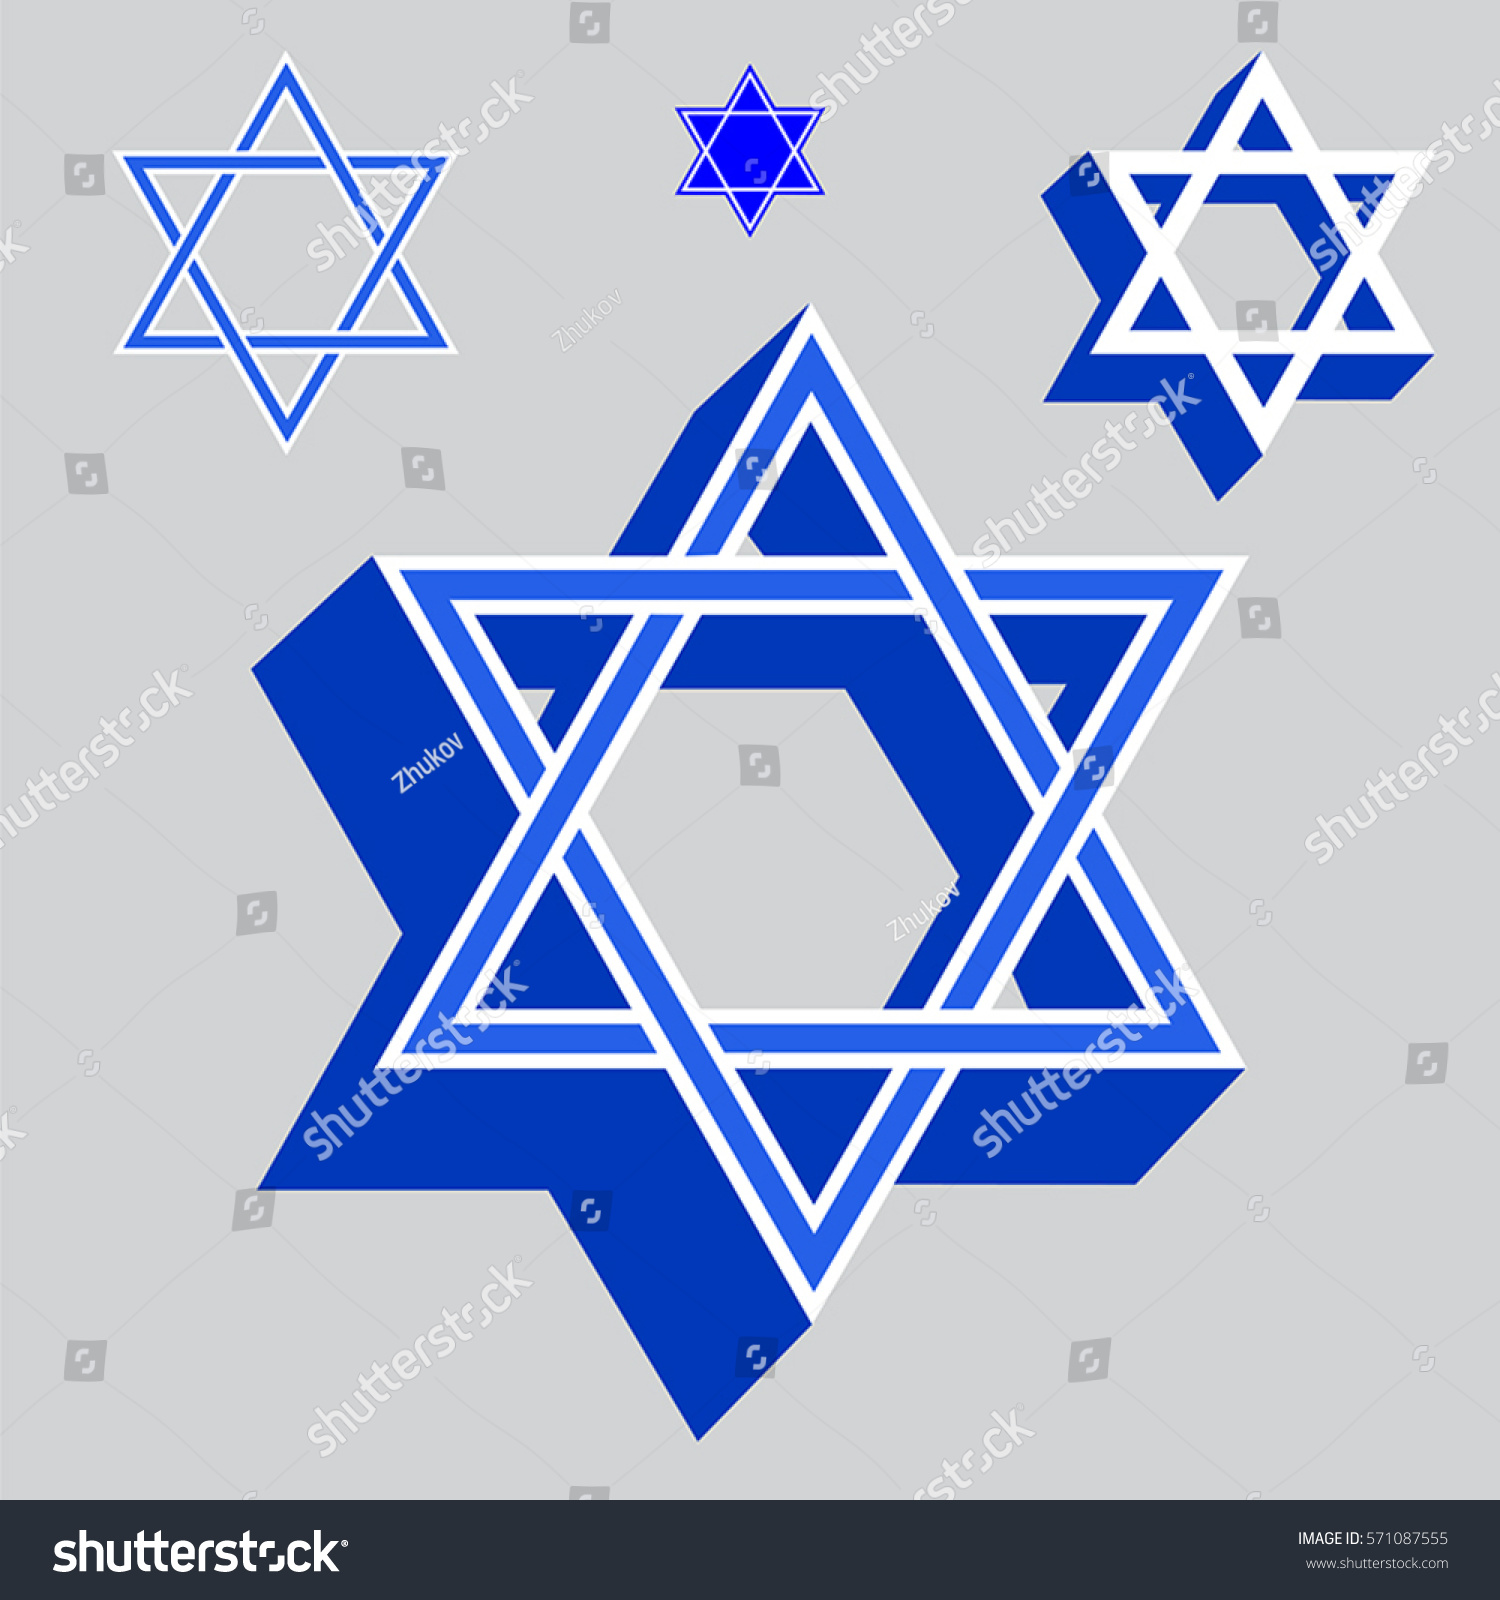 Religious symbols of judaism images symbol and sign ideas jewish sacred symbols gallery symbol and sign ideas star david jewish religious symbols vector stock vector biocorpaavc